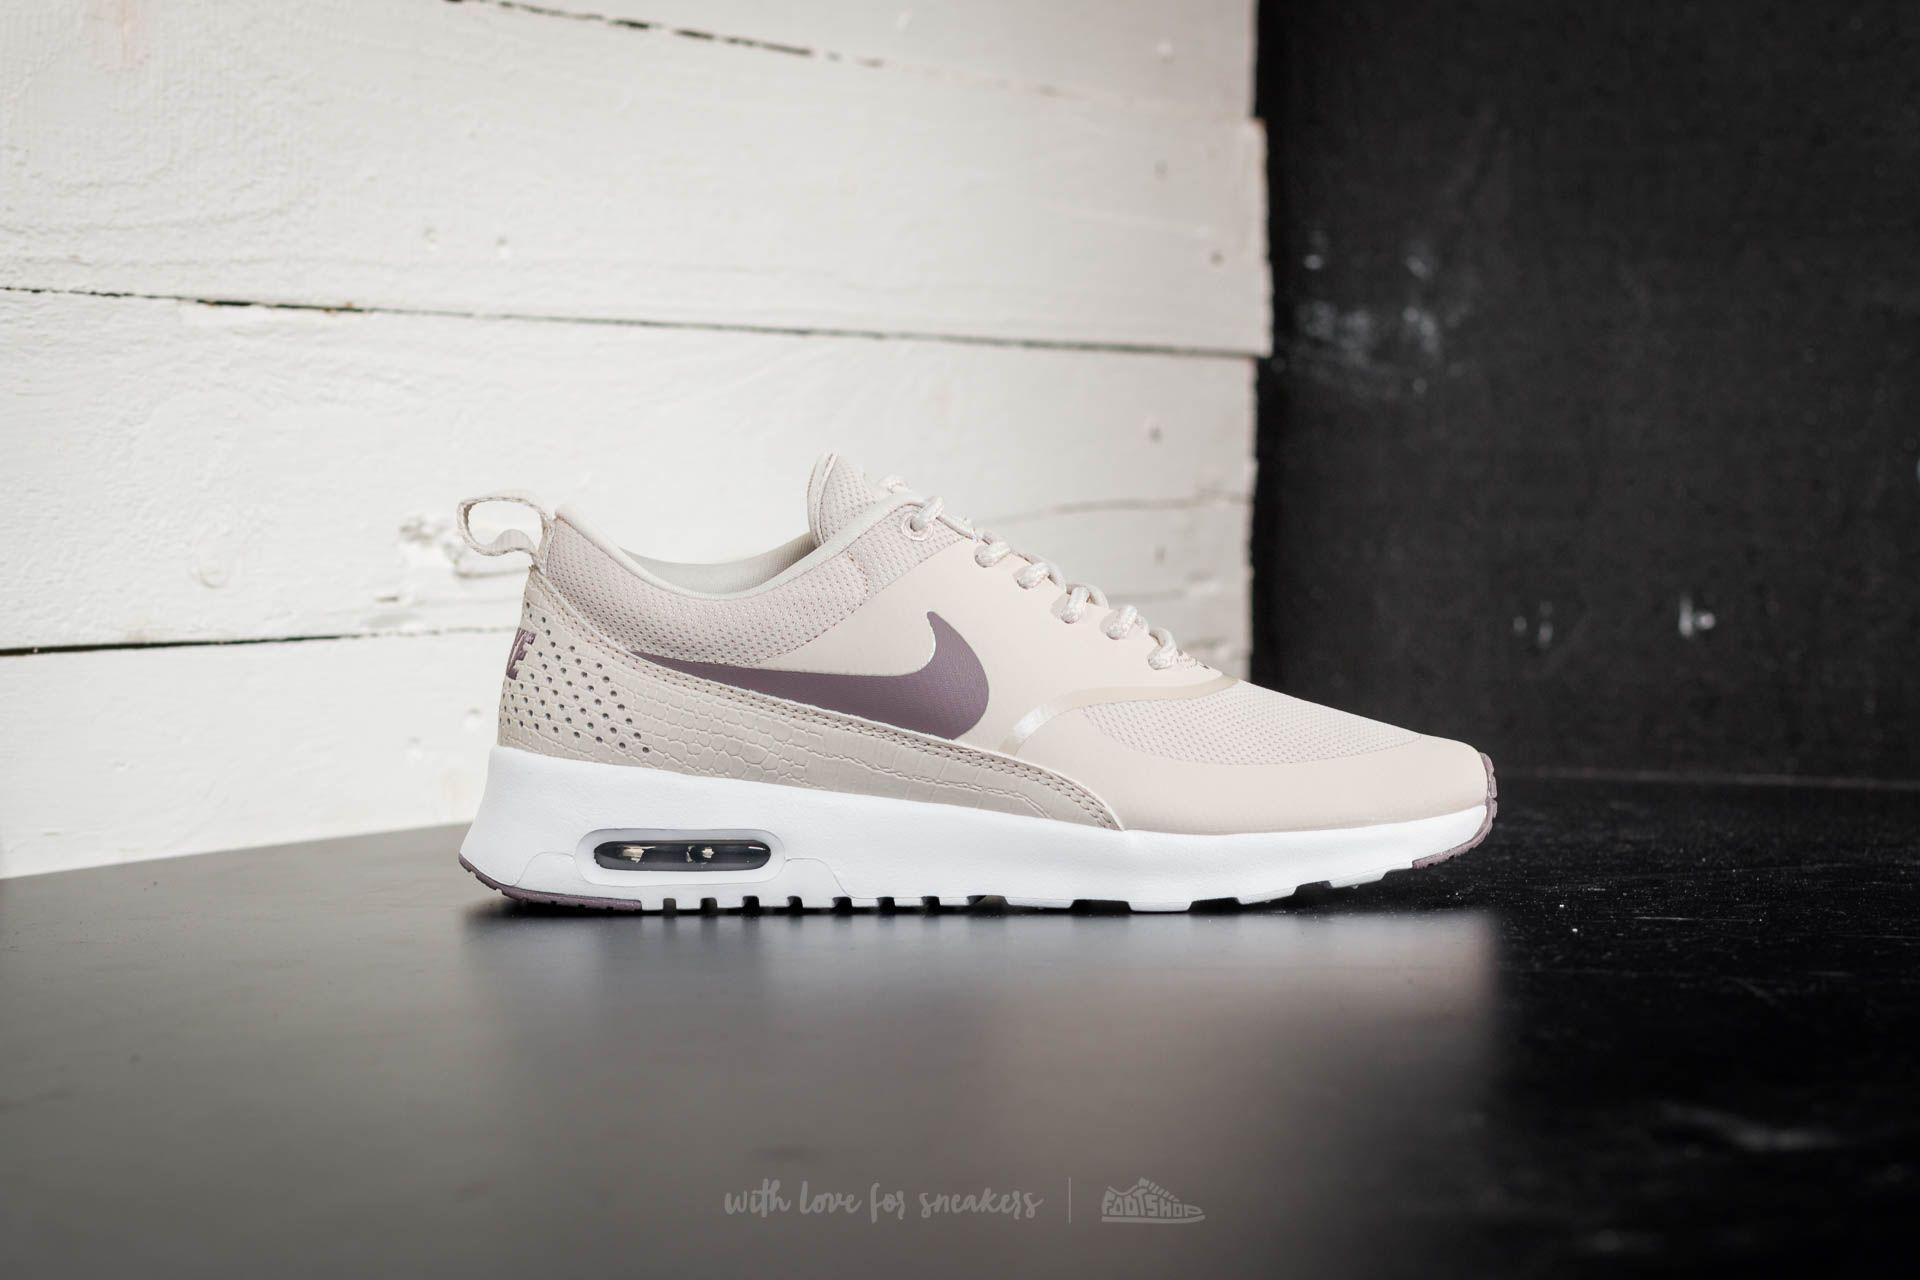 Nike Air Max Thea Women light orewood browntaupe grey au